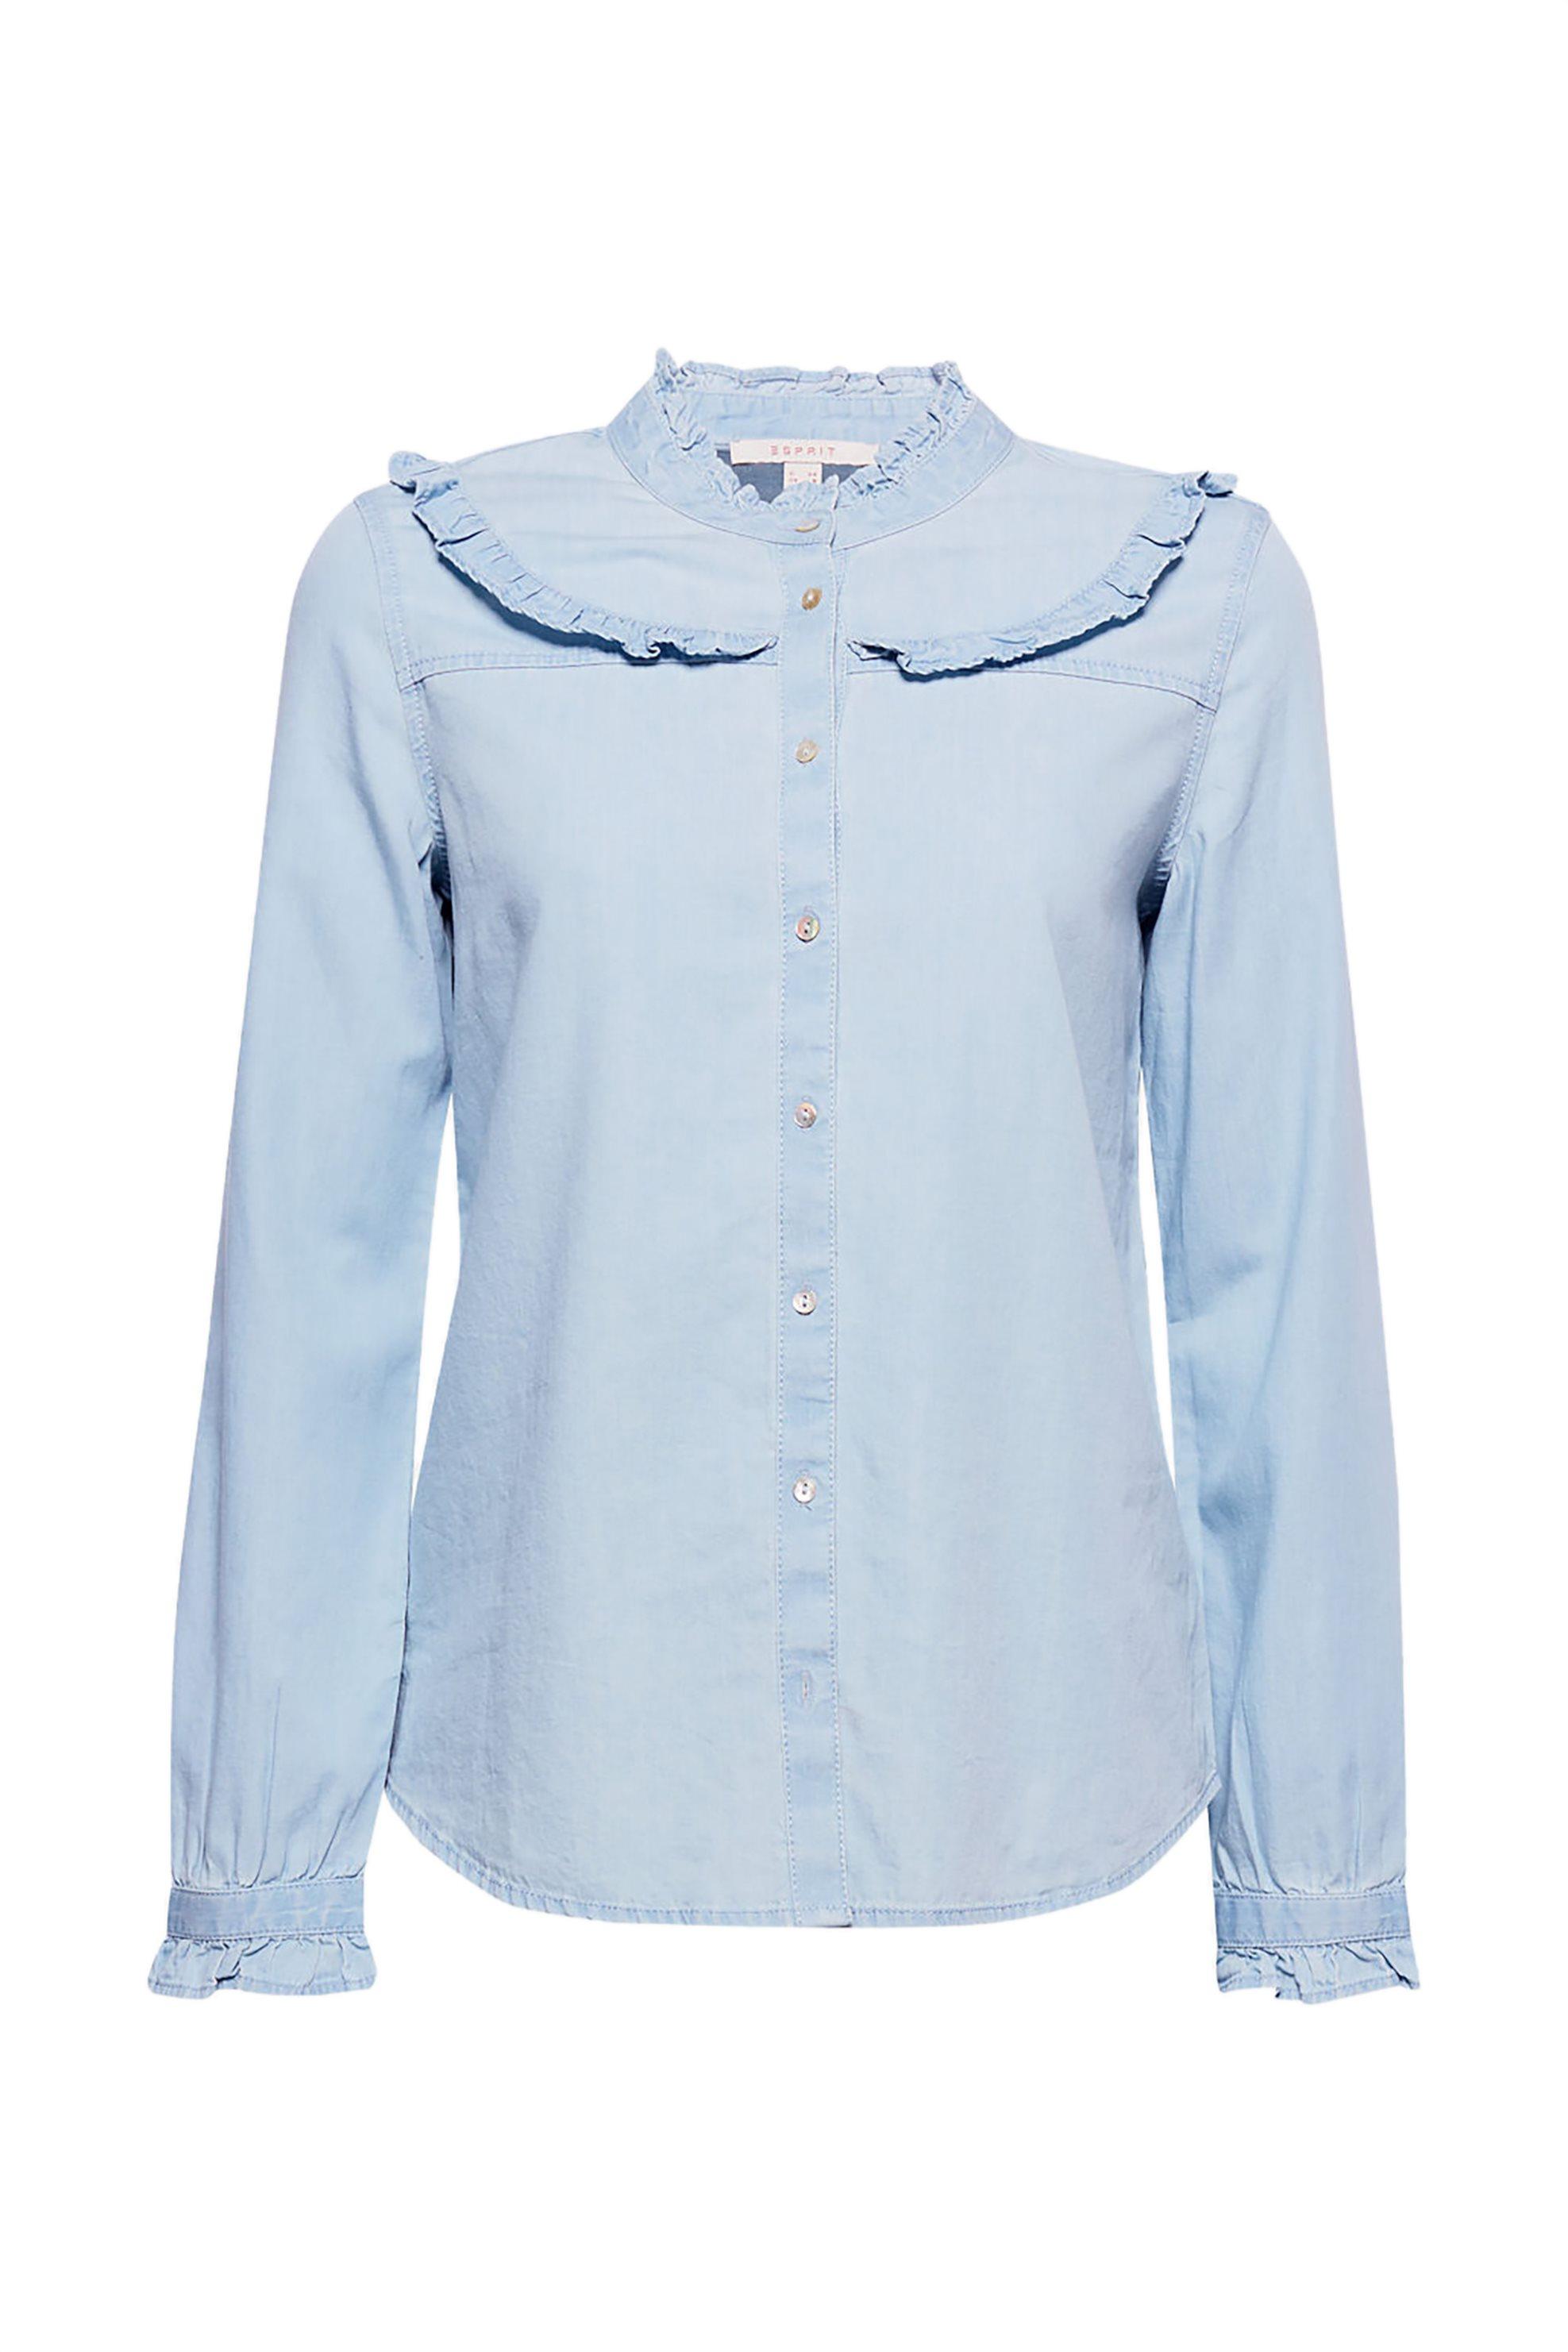 7620845950b7 Γυναικεία   Ρούχα   Πουκάμισα   Denim πουκάμισο με βαμβάκι και ...